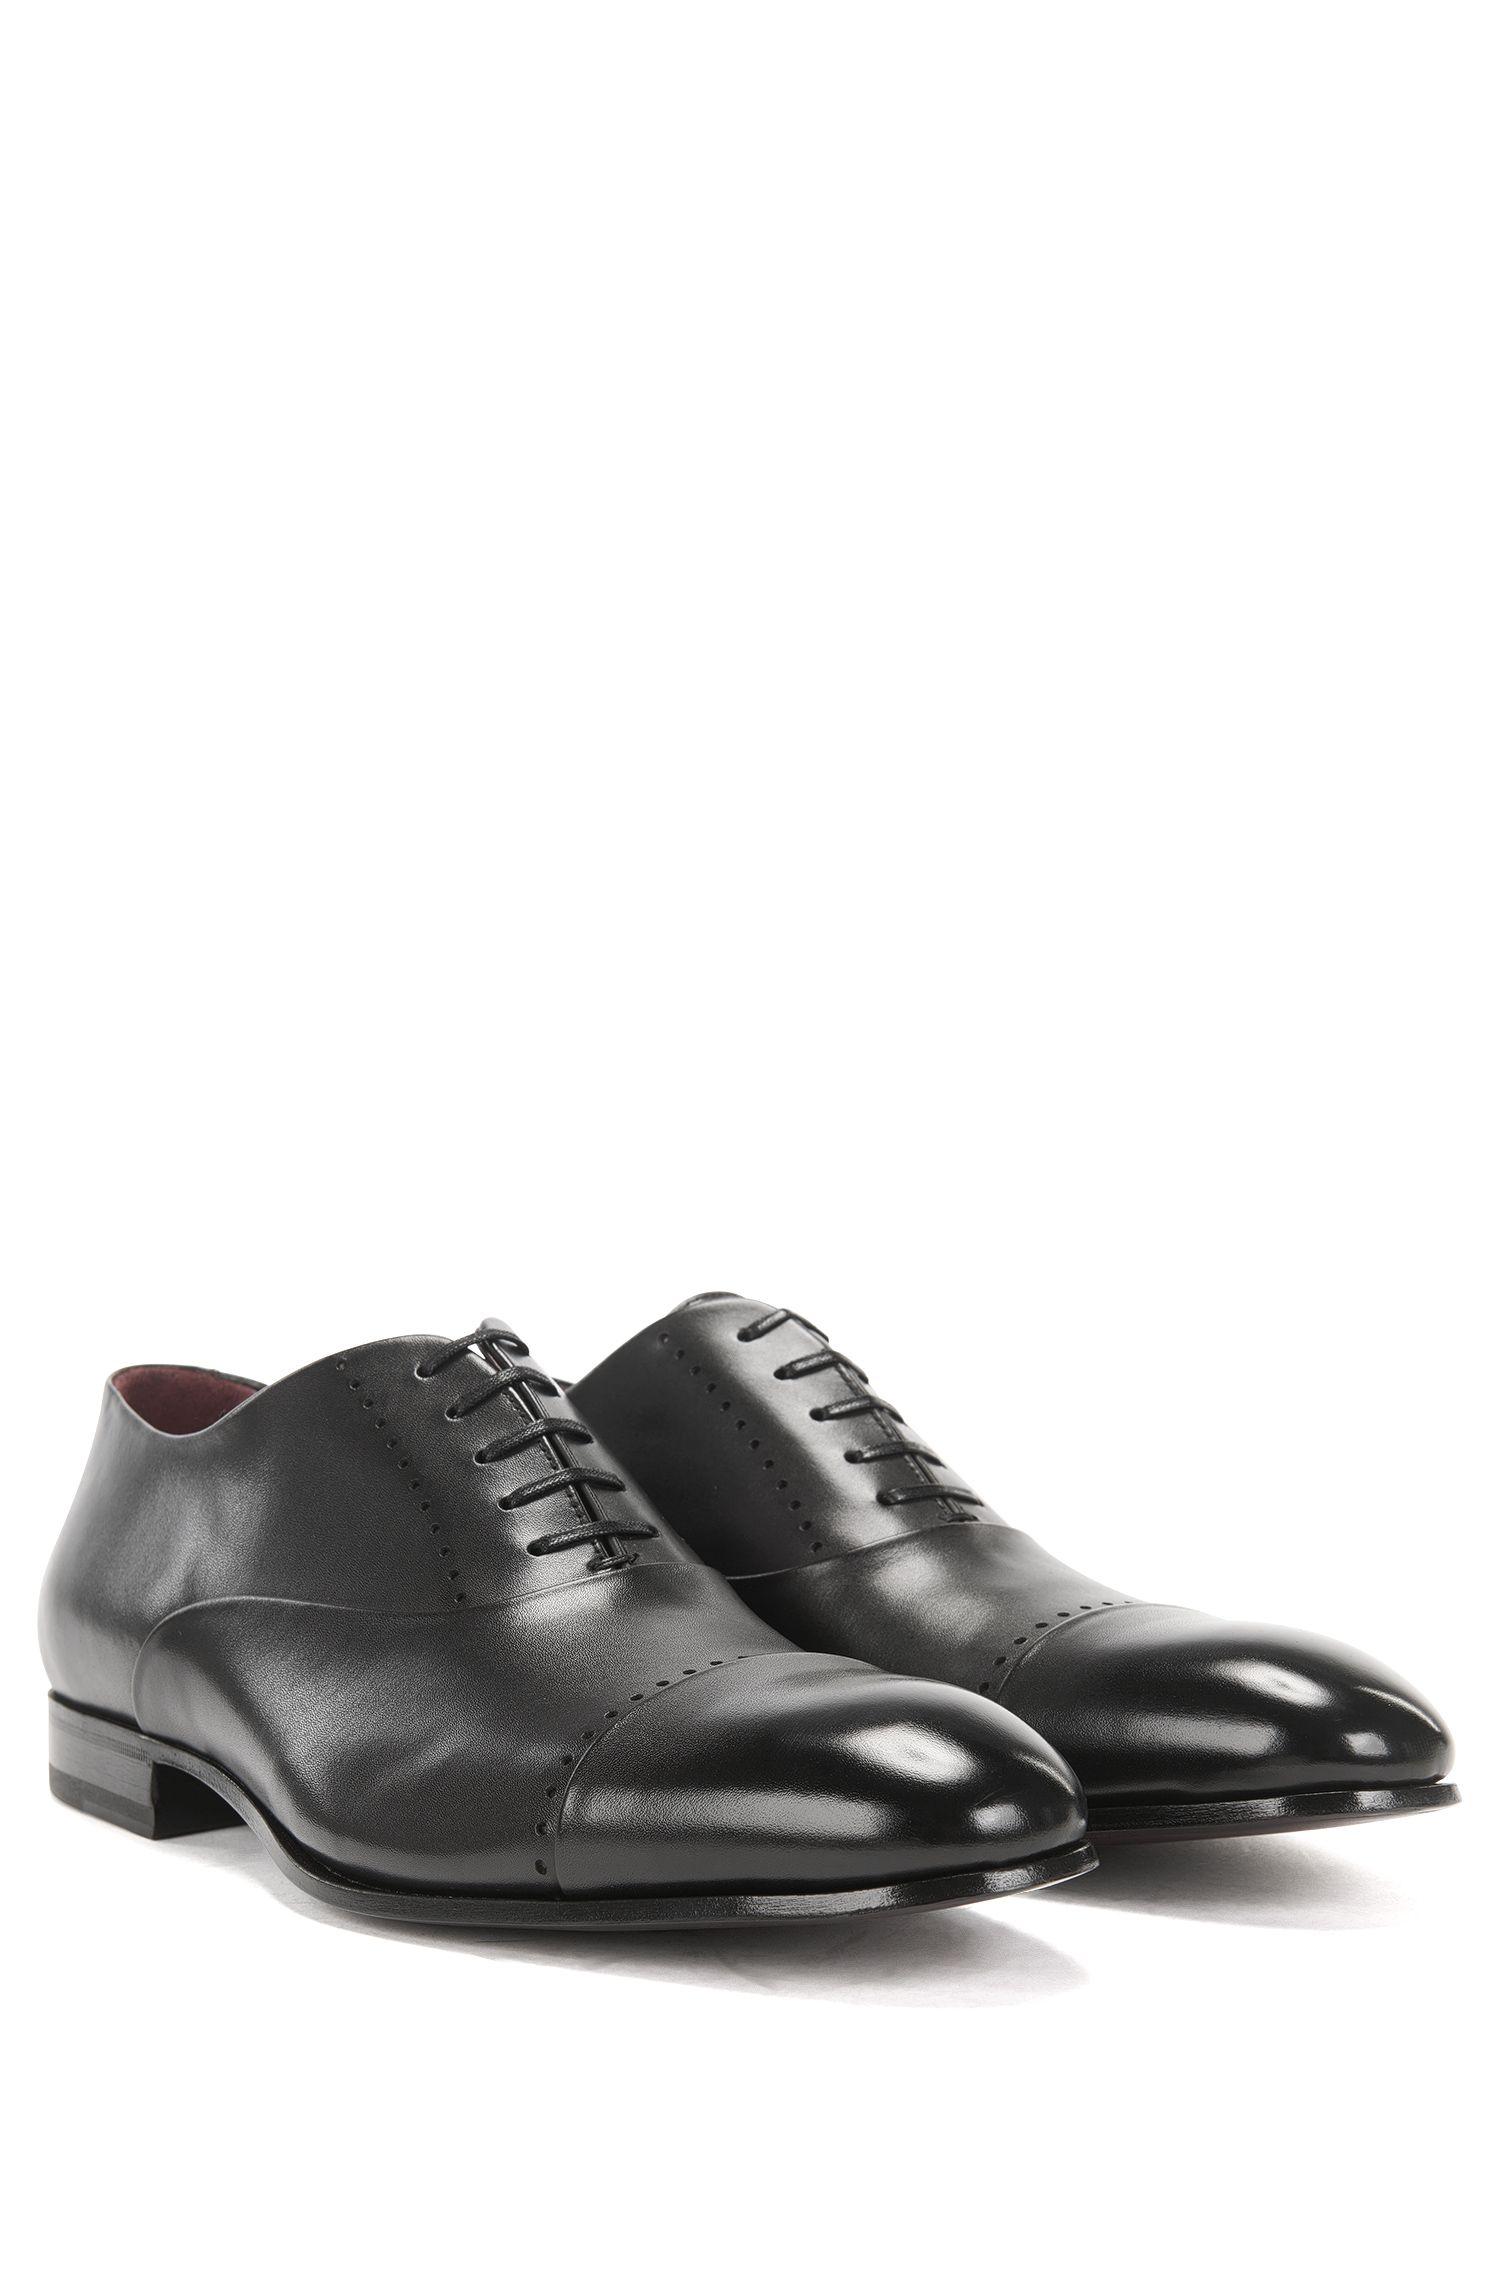 Oxford-Schuhe aus Leder mit Budapester-Details